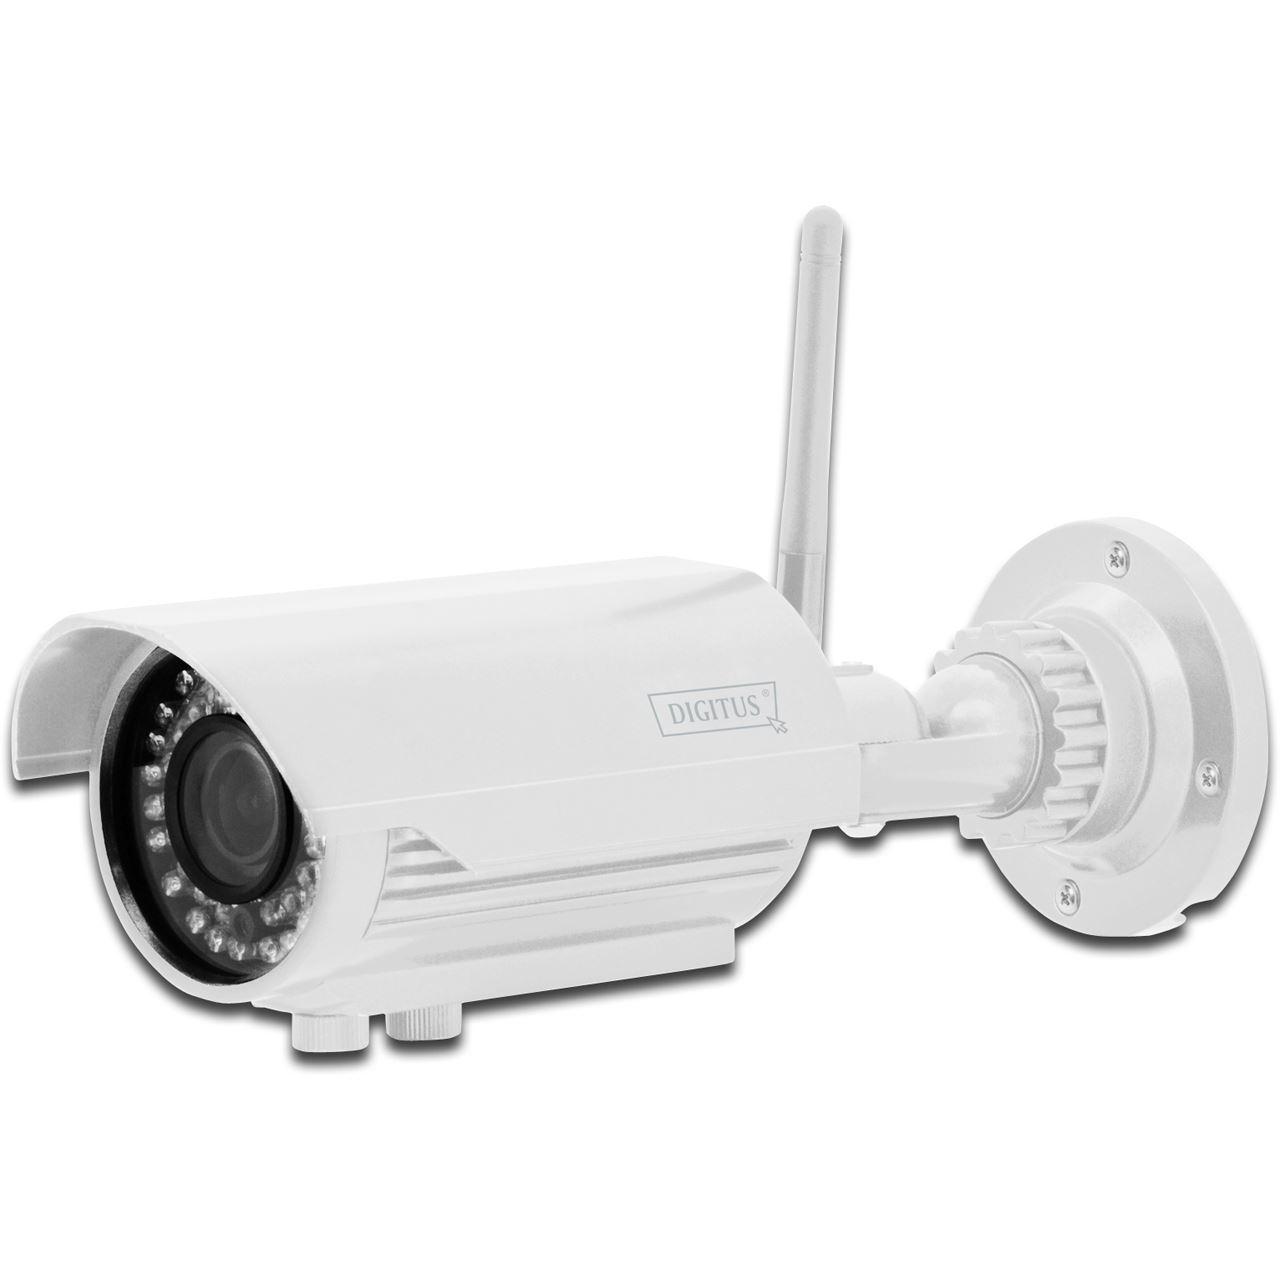 digitus ip cam optivario wlan plug view outdoor tag nacht ip kameras lan. Black Bedroom Furniture Sets. Home Design Ideas